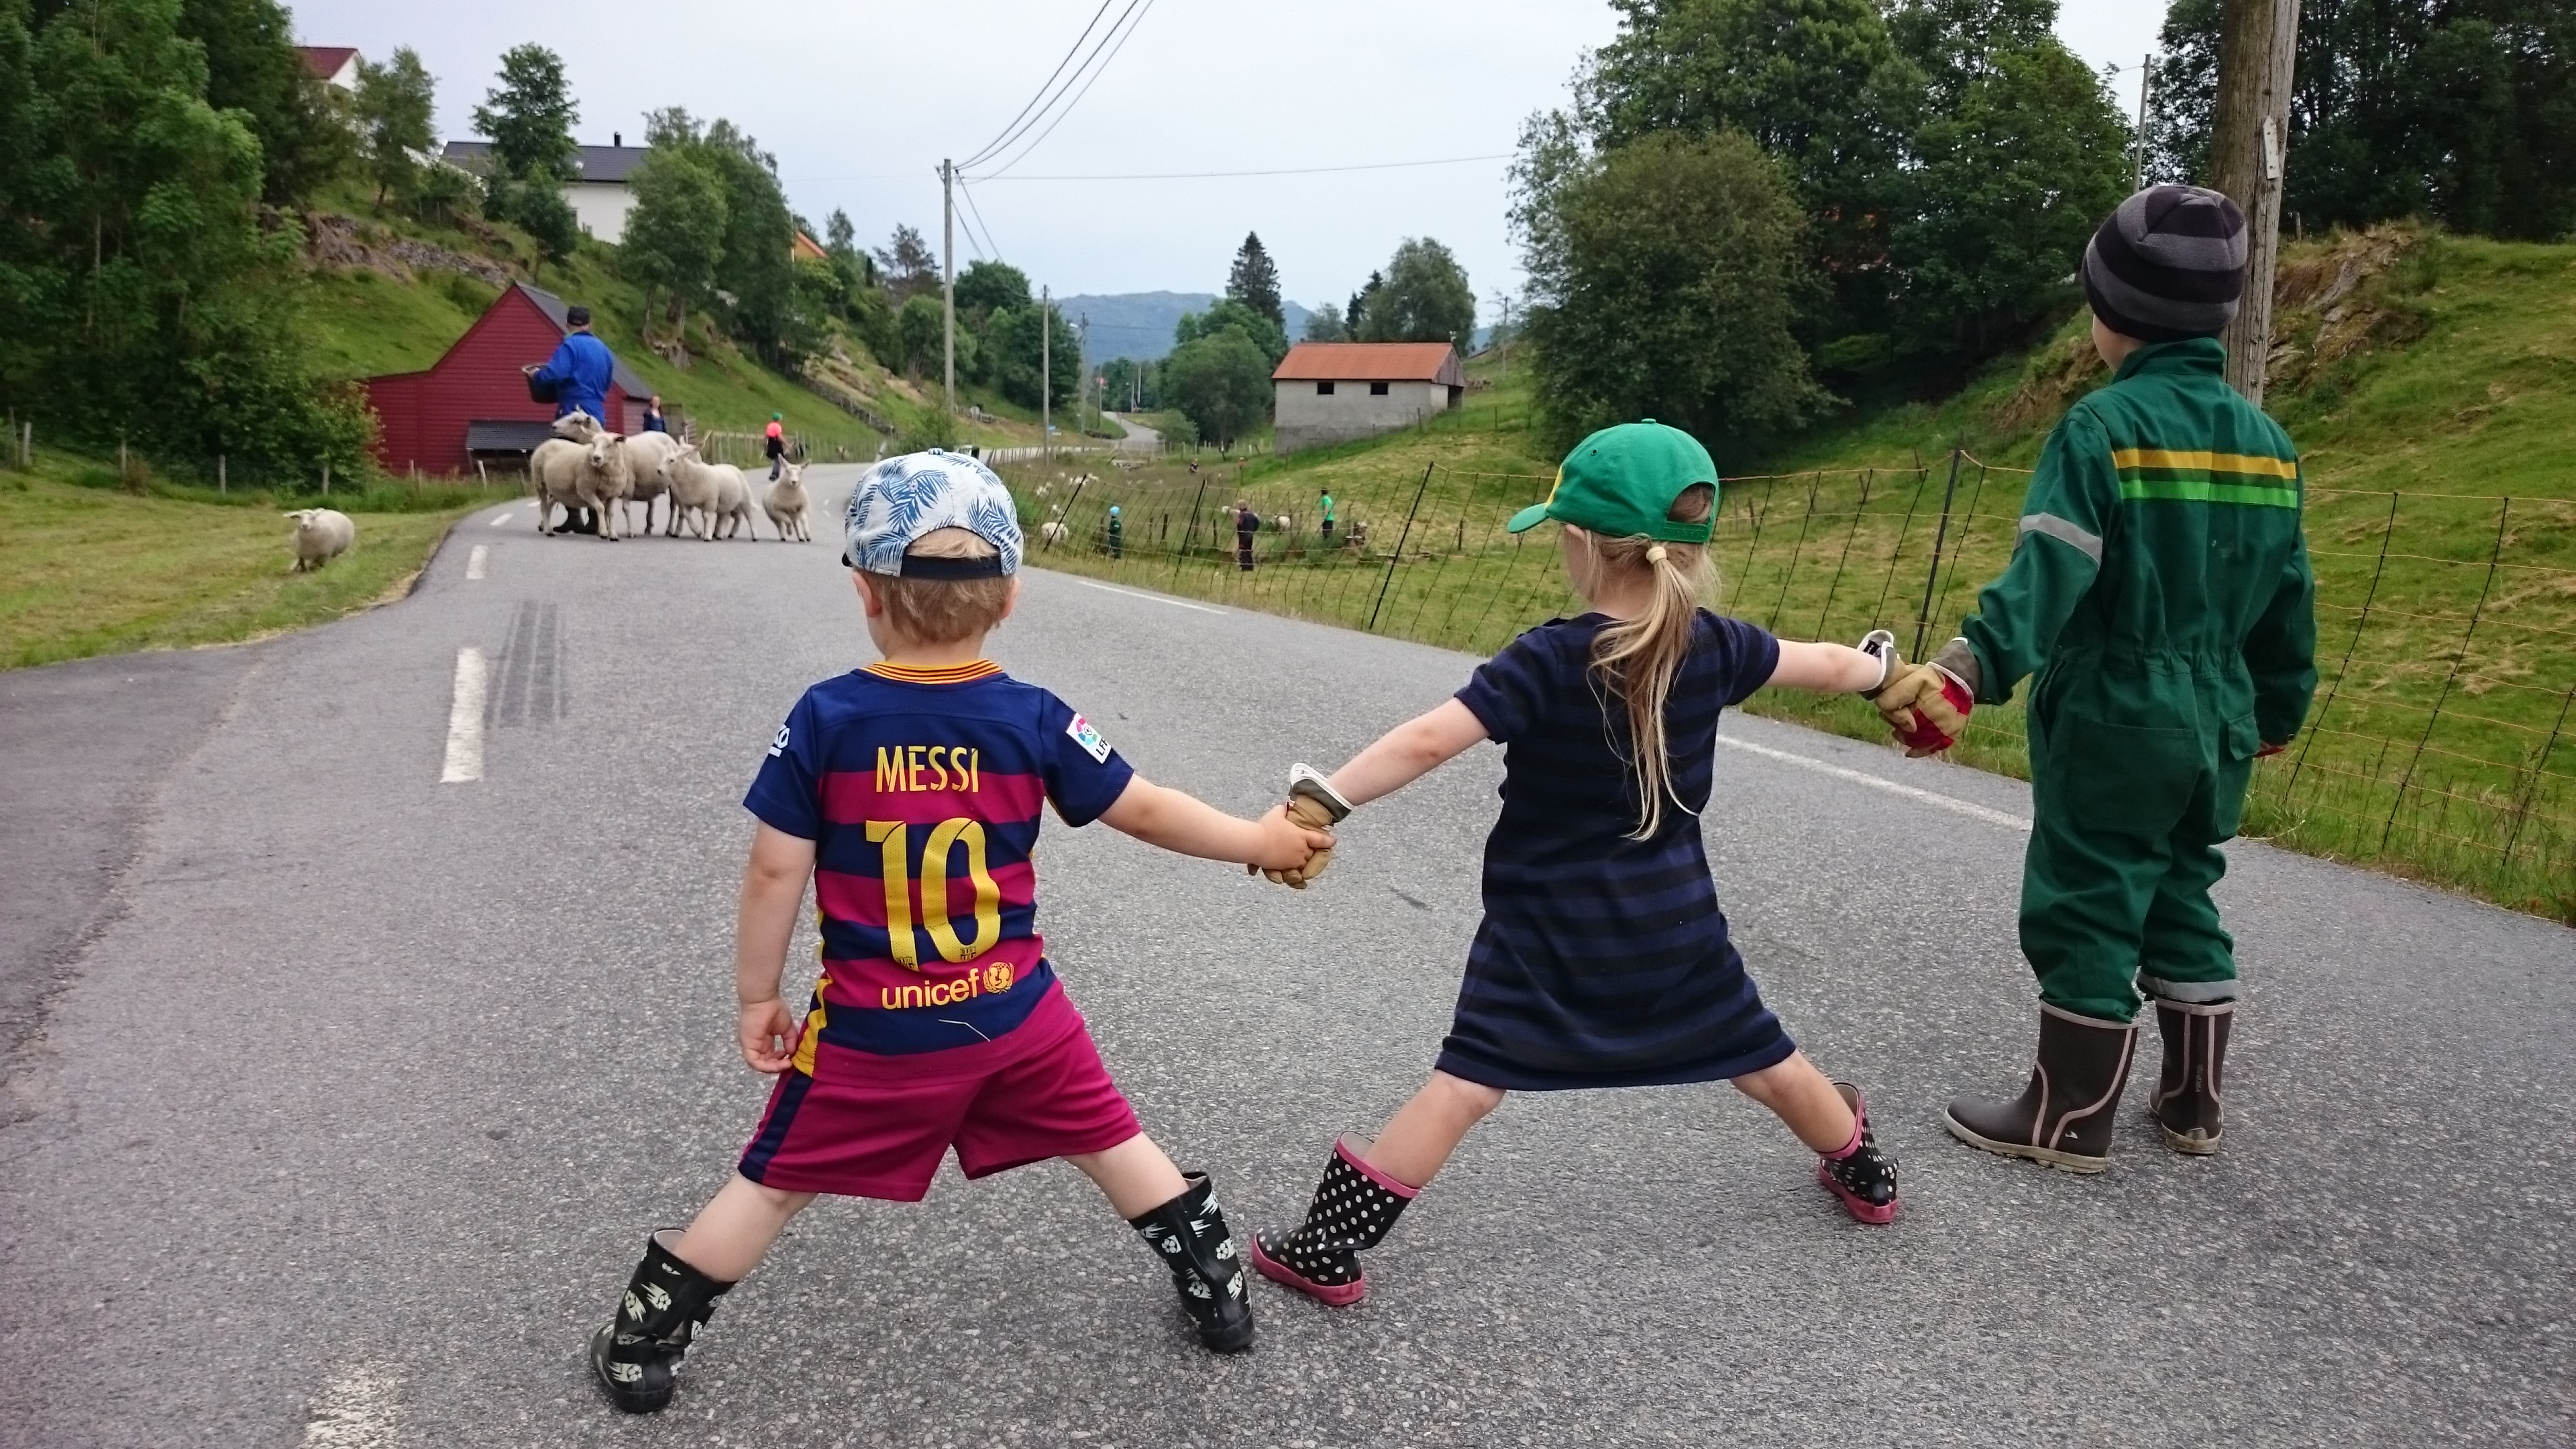 Rita Sæle Langeland_Messi på sauesanking.jpg